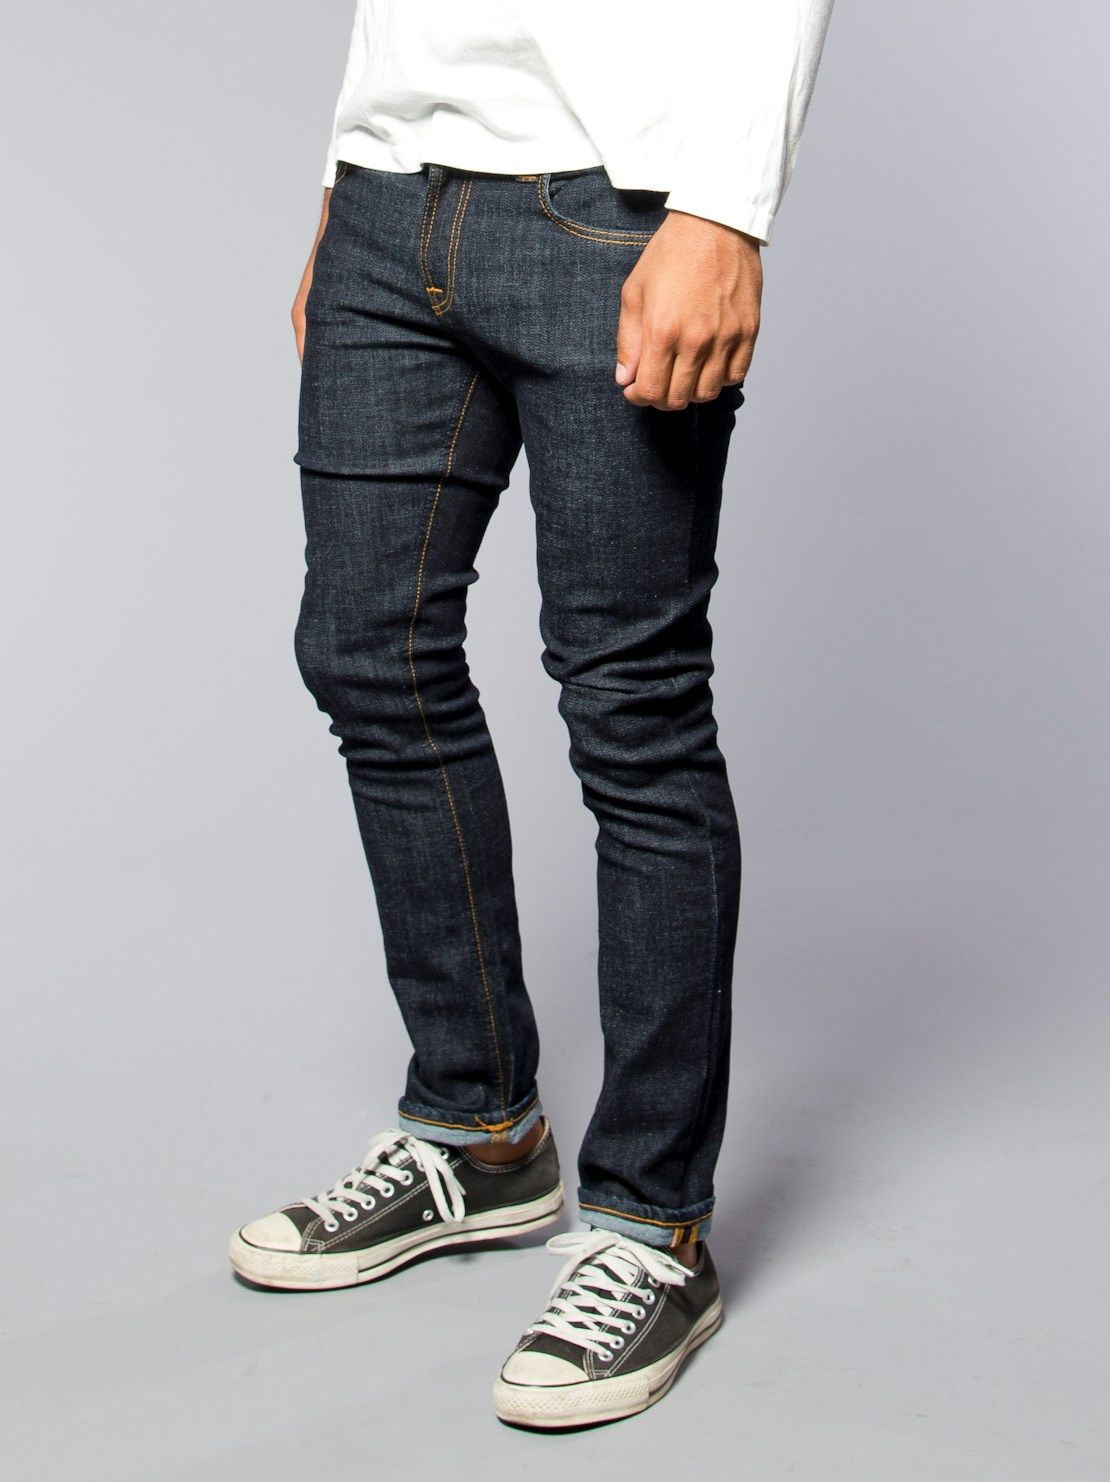 Tube Tom Twill Rinsed - Nudie Jeans Co Online Shop  2640174d4